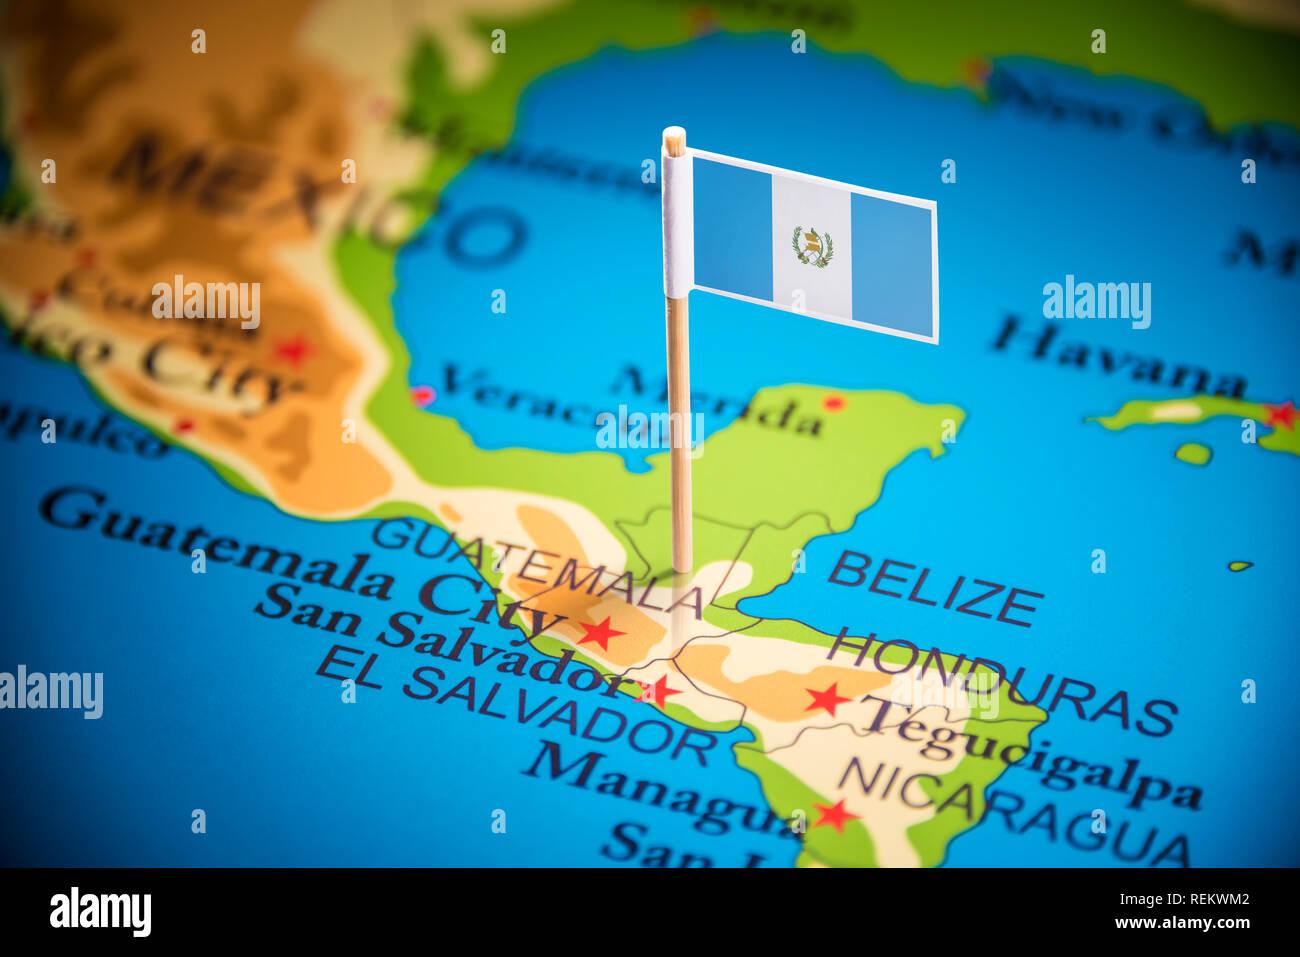 Map Of Guatemala Stockfotos & Map Of Guatemala Bilder - Alamy